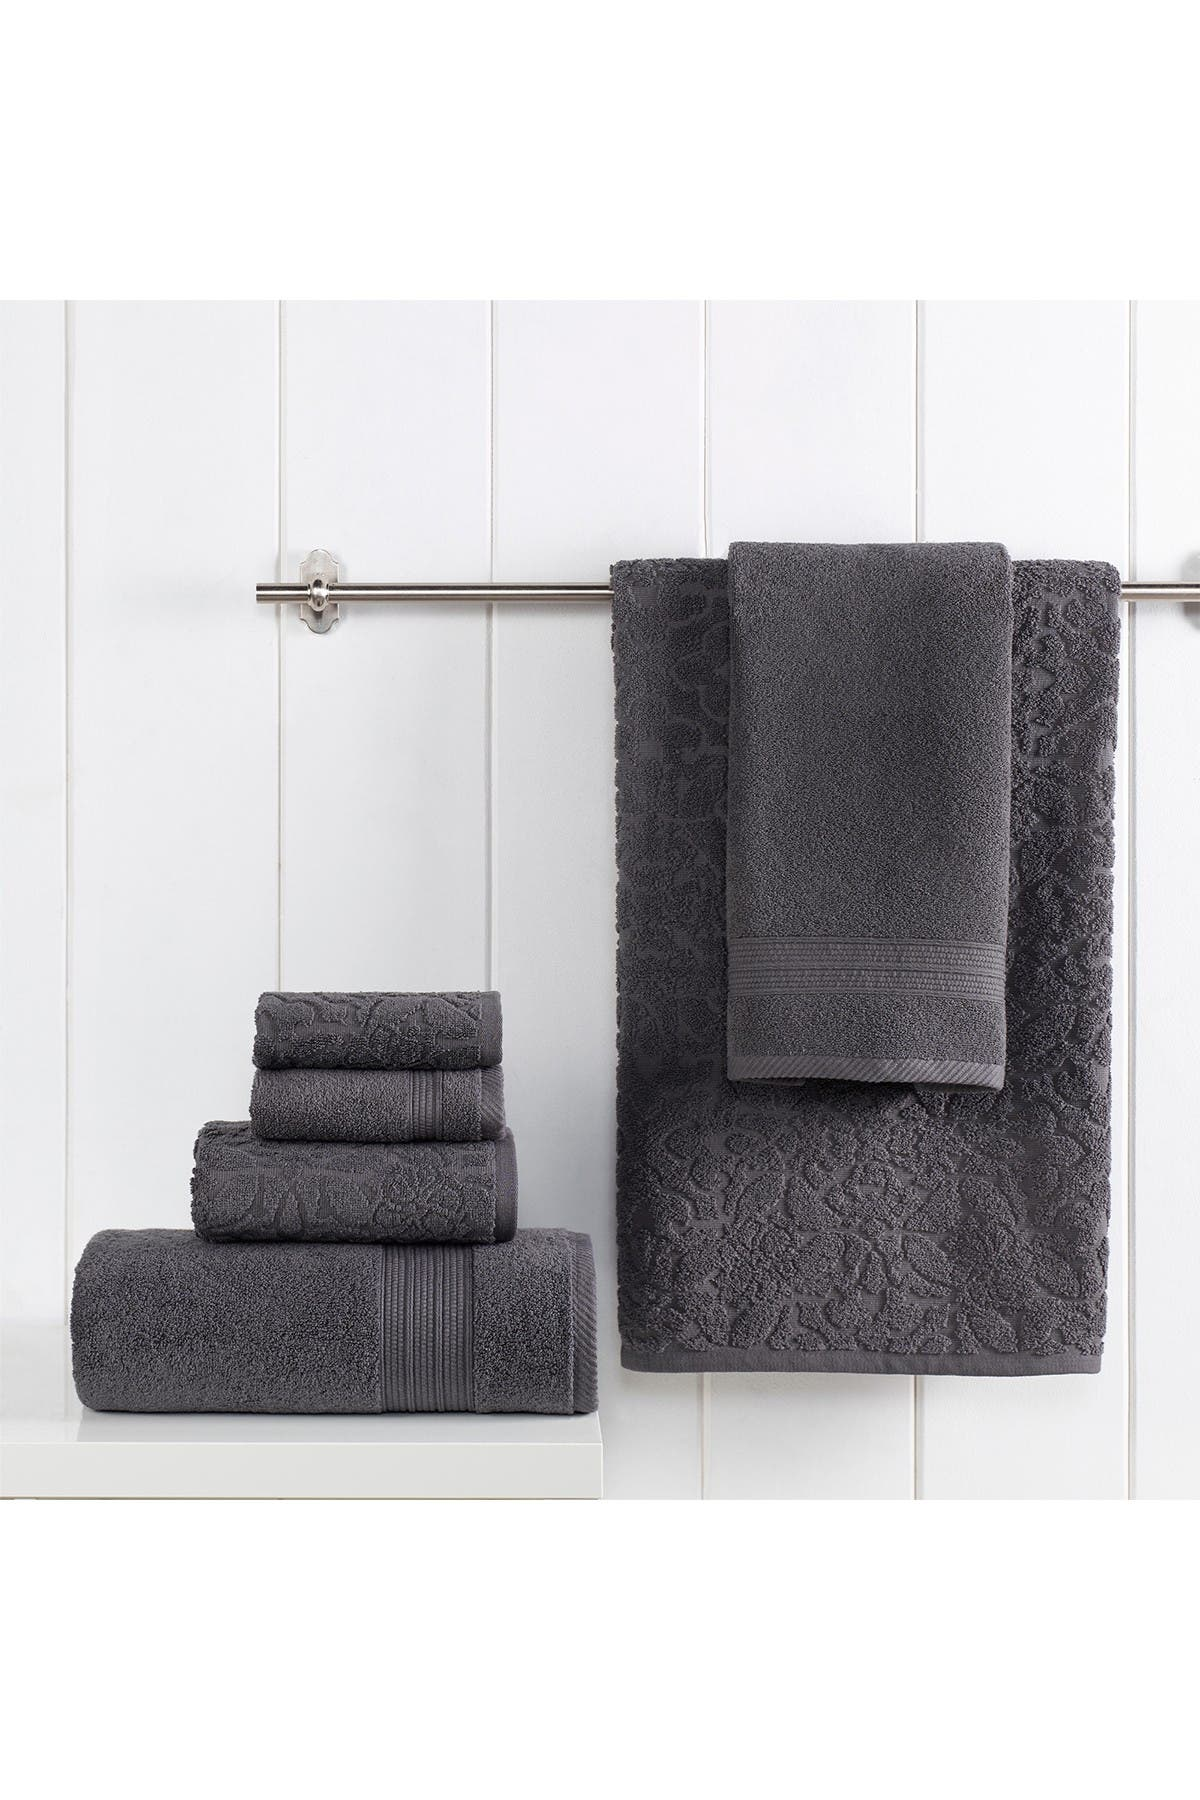 Modern Threads Jacquard Turkish Made 6-Piece Towel Set - Coal at Nordstrom Rack